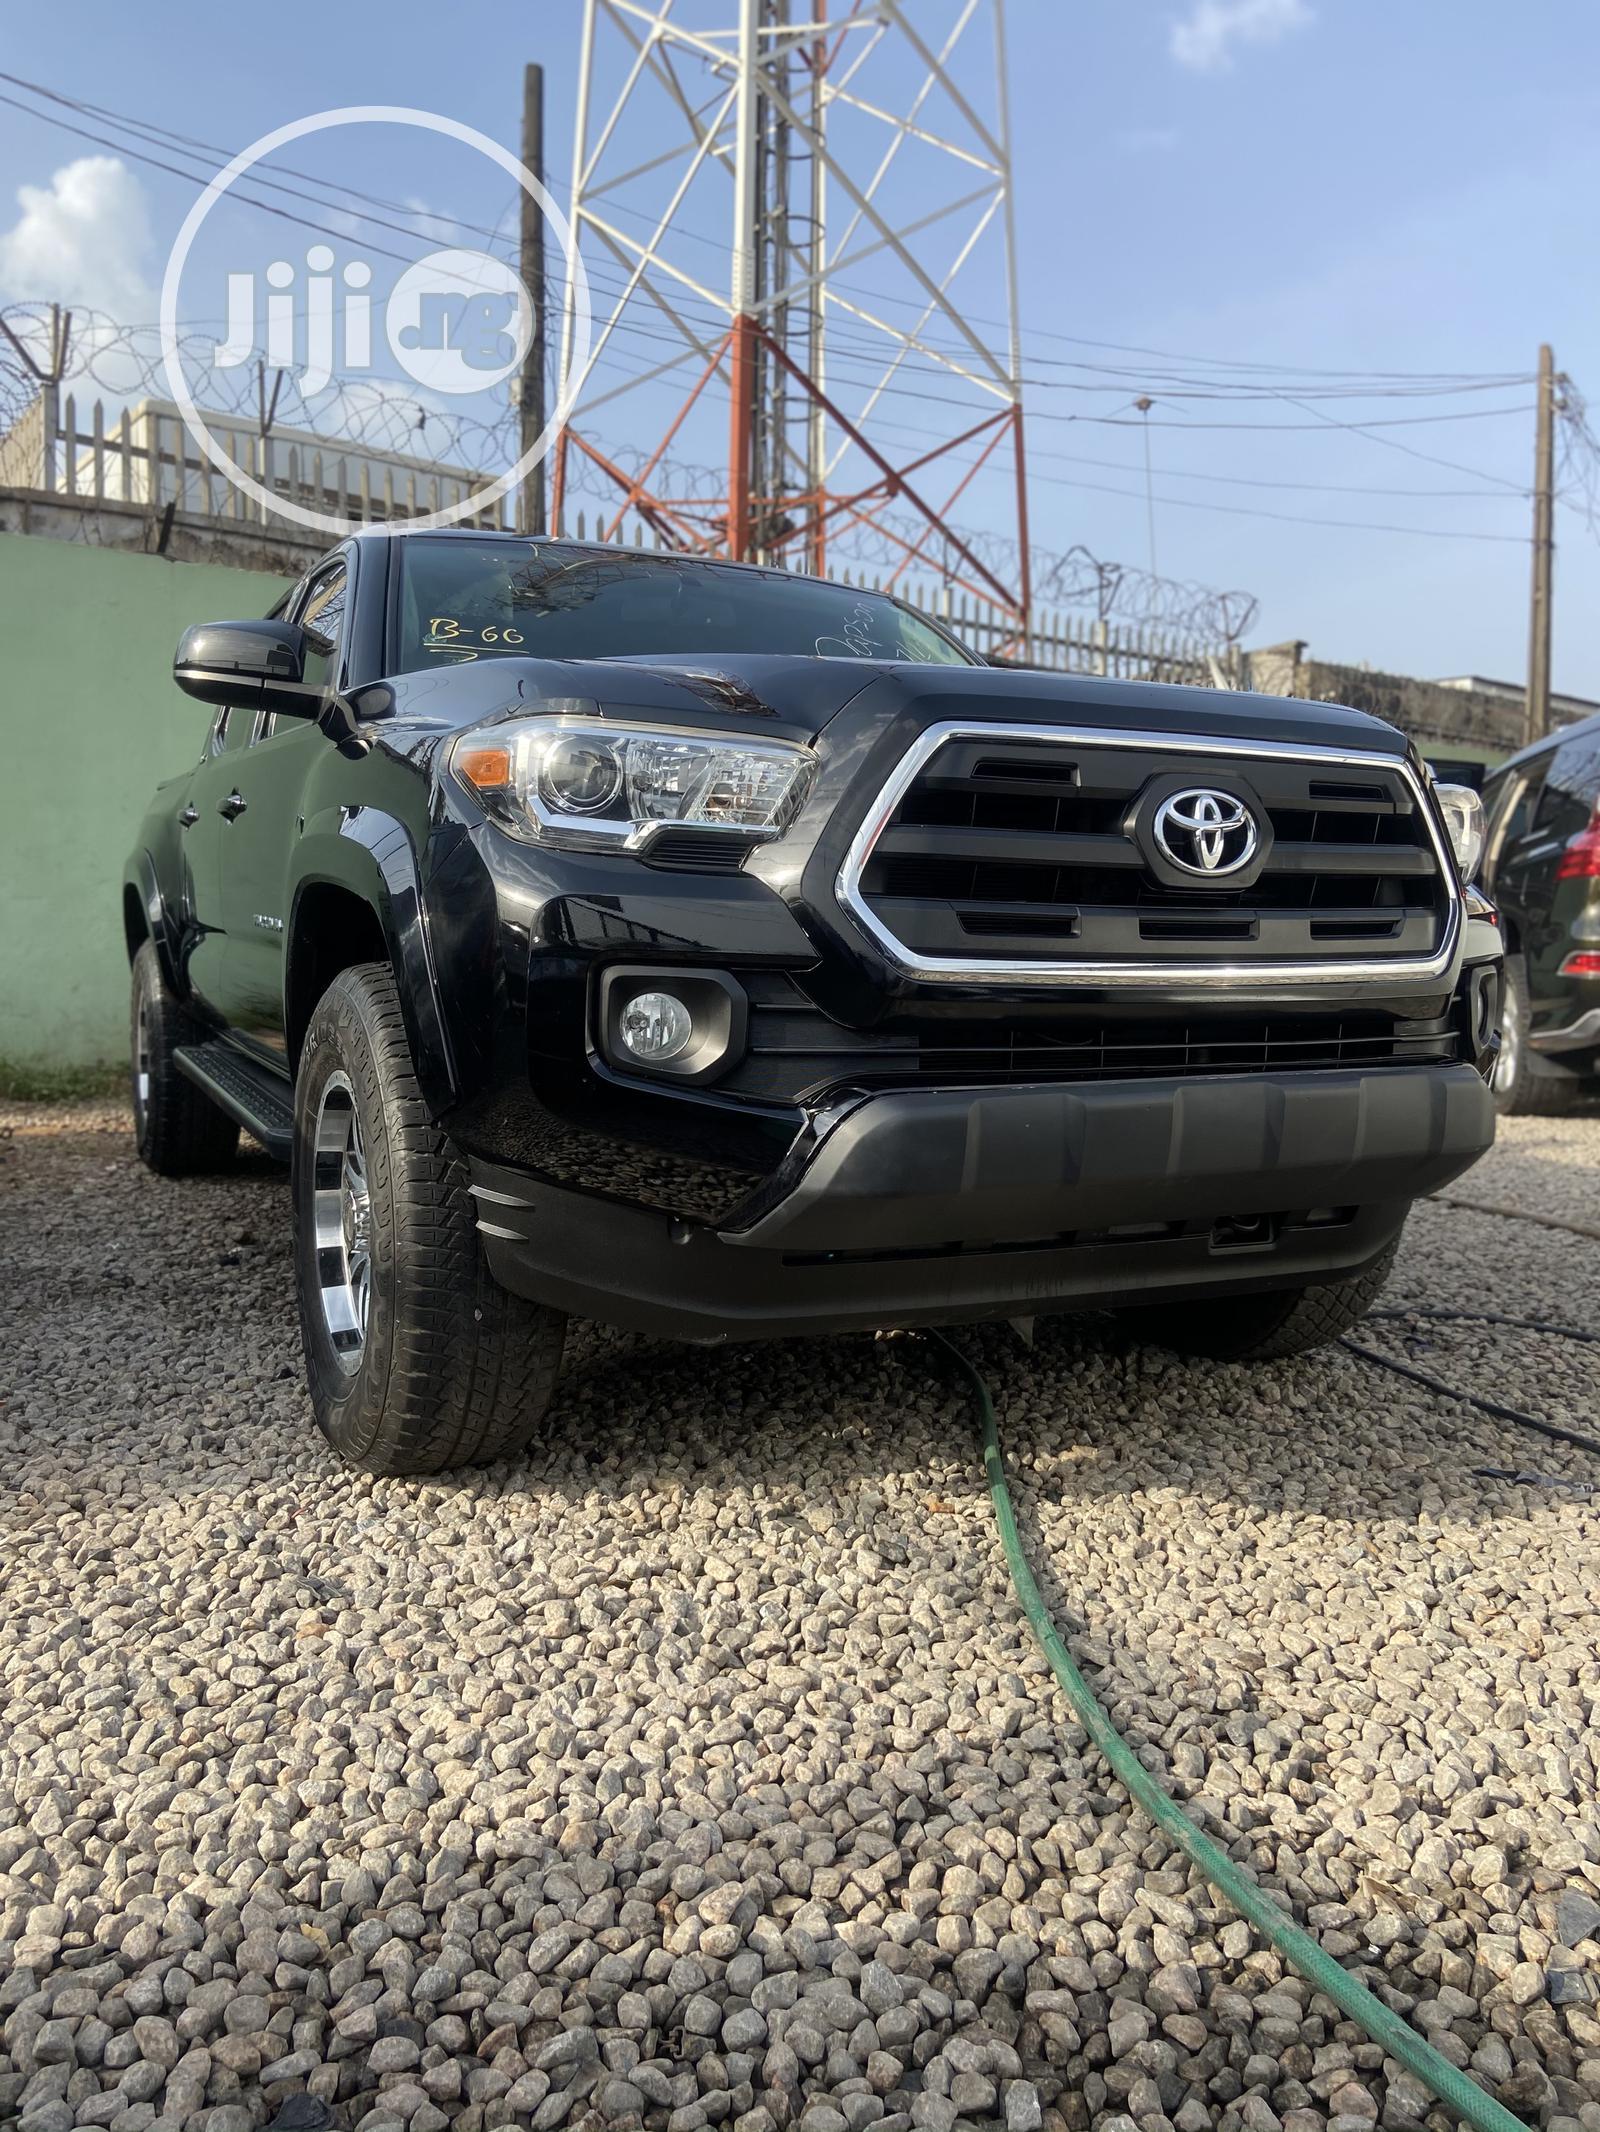 Toyota Tacoma 2016 4dr Double Cab Black